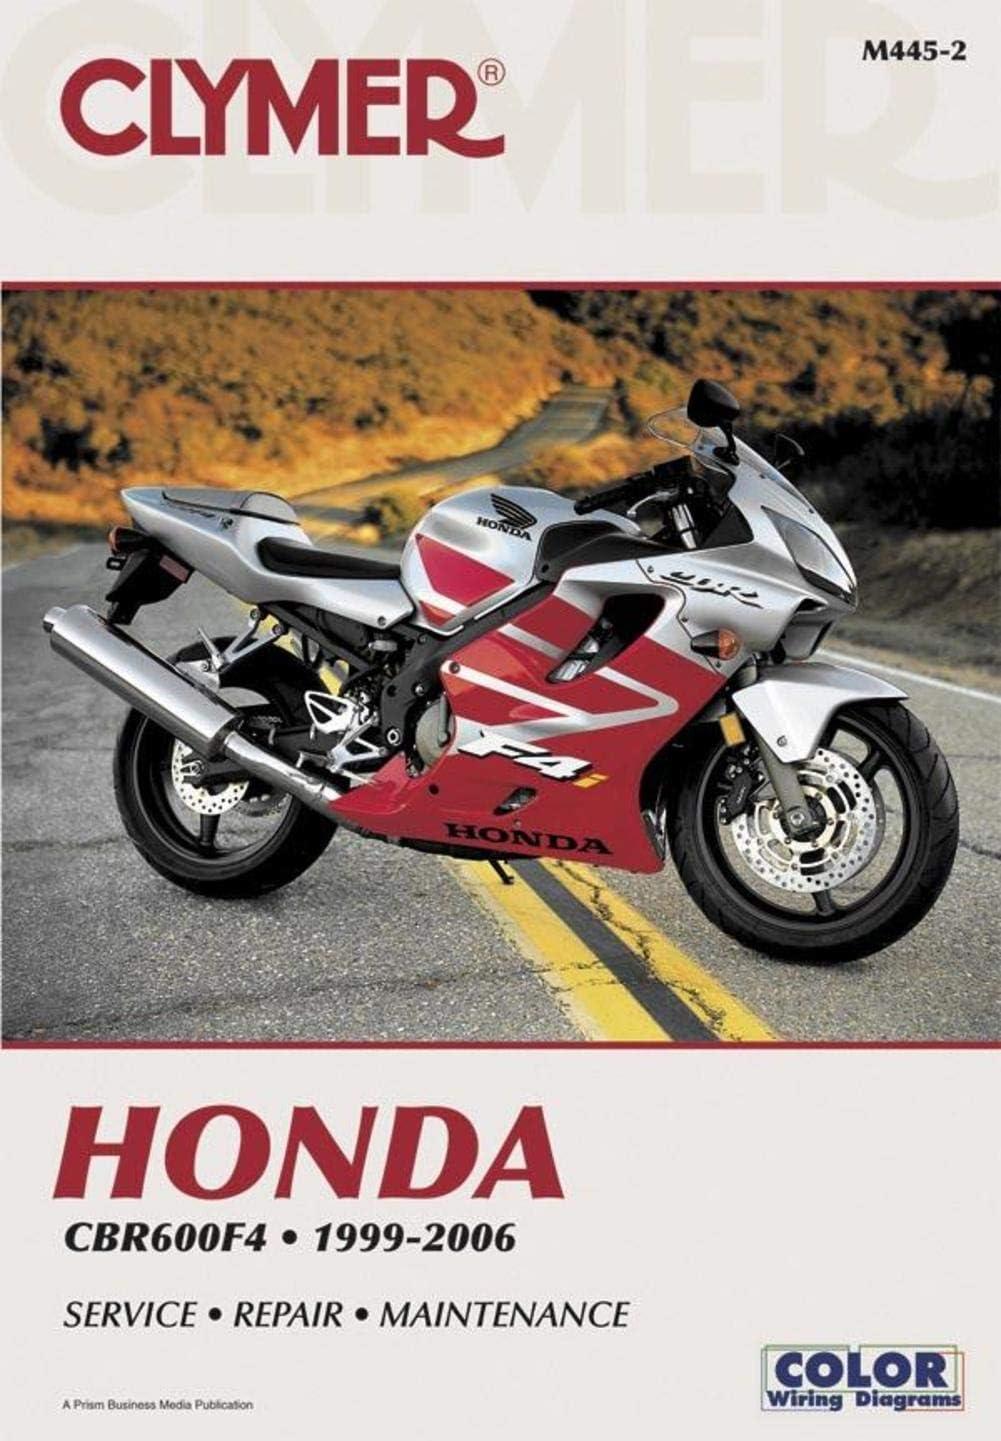 2000 Honda Cbr 600 F4 Wiring Diagram from images-na.ssl-images-amazon.com